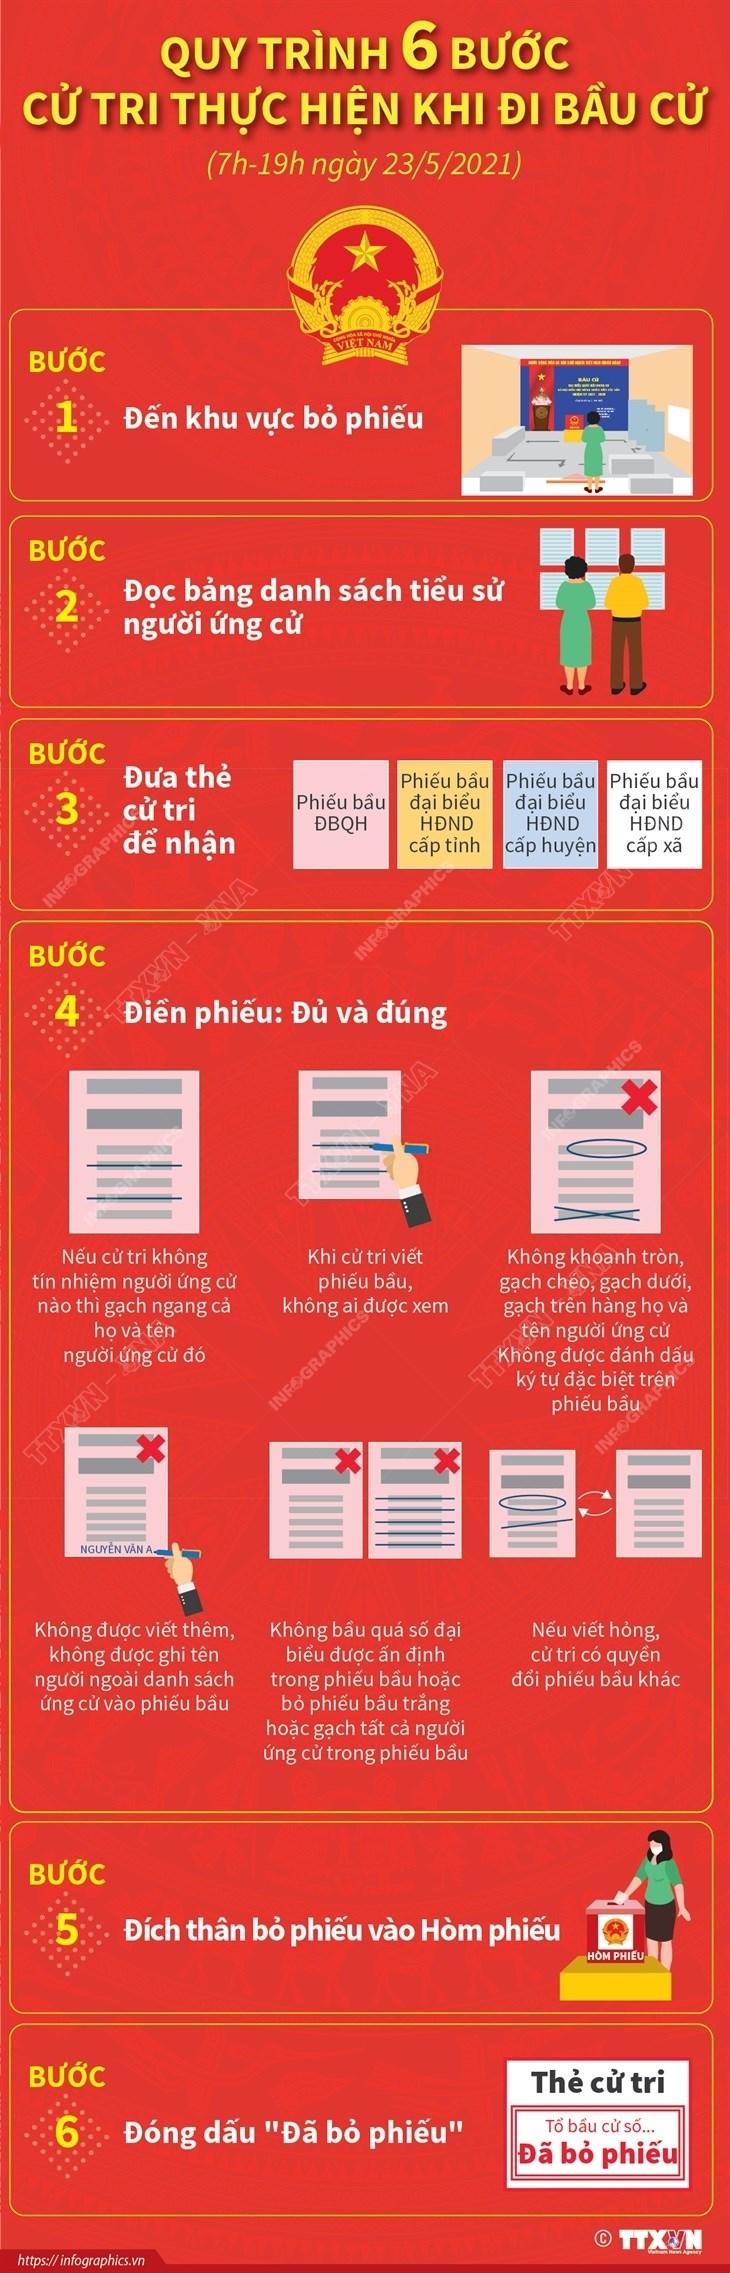 [Infographics] Quy trinh 6 buoc cu tri thuc hien khi di bau cu hinh anh 1